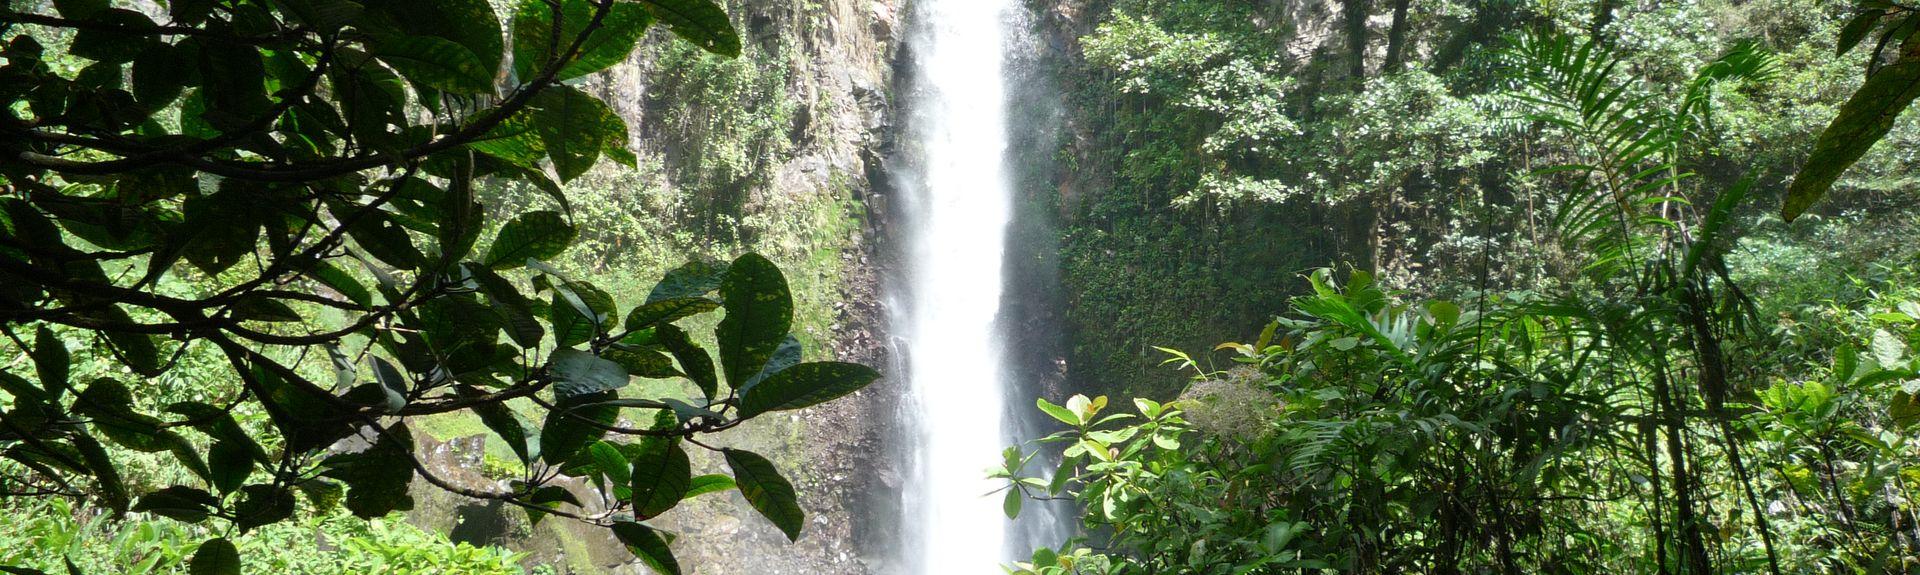 Boquete, Chiriquí Province, Panama